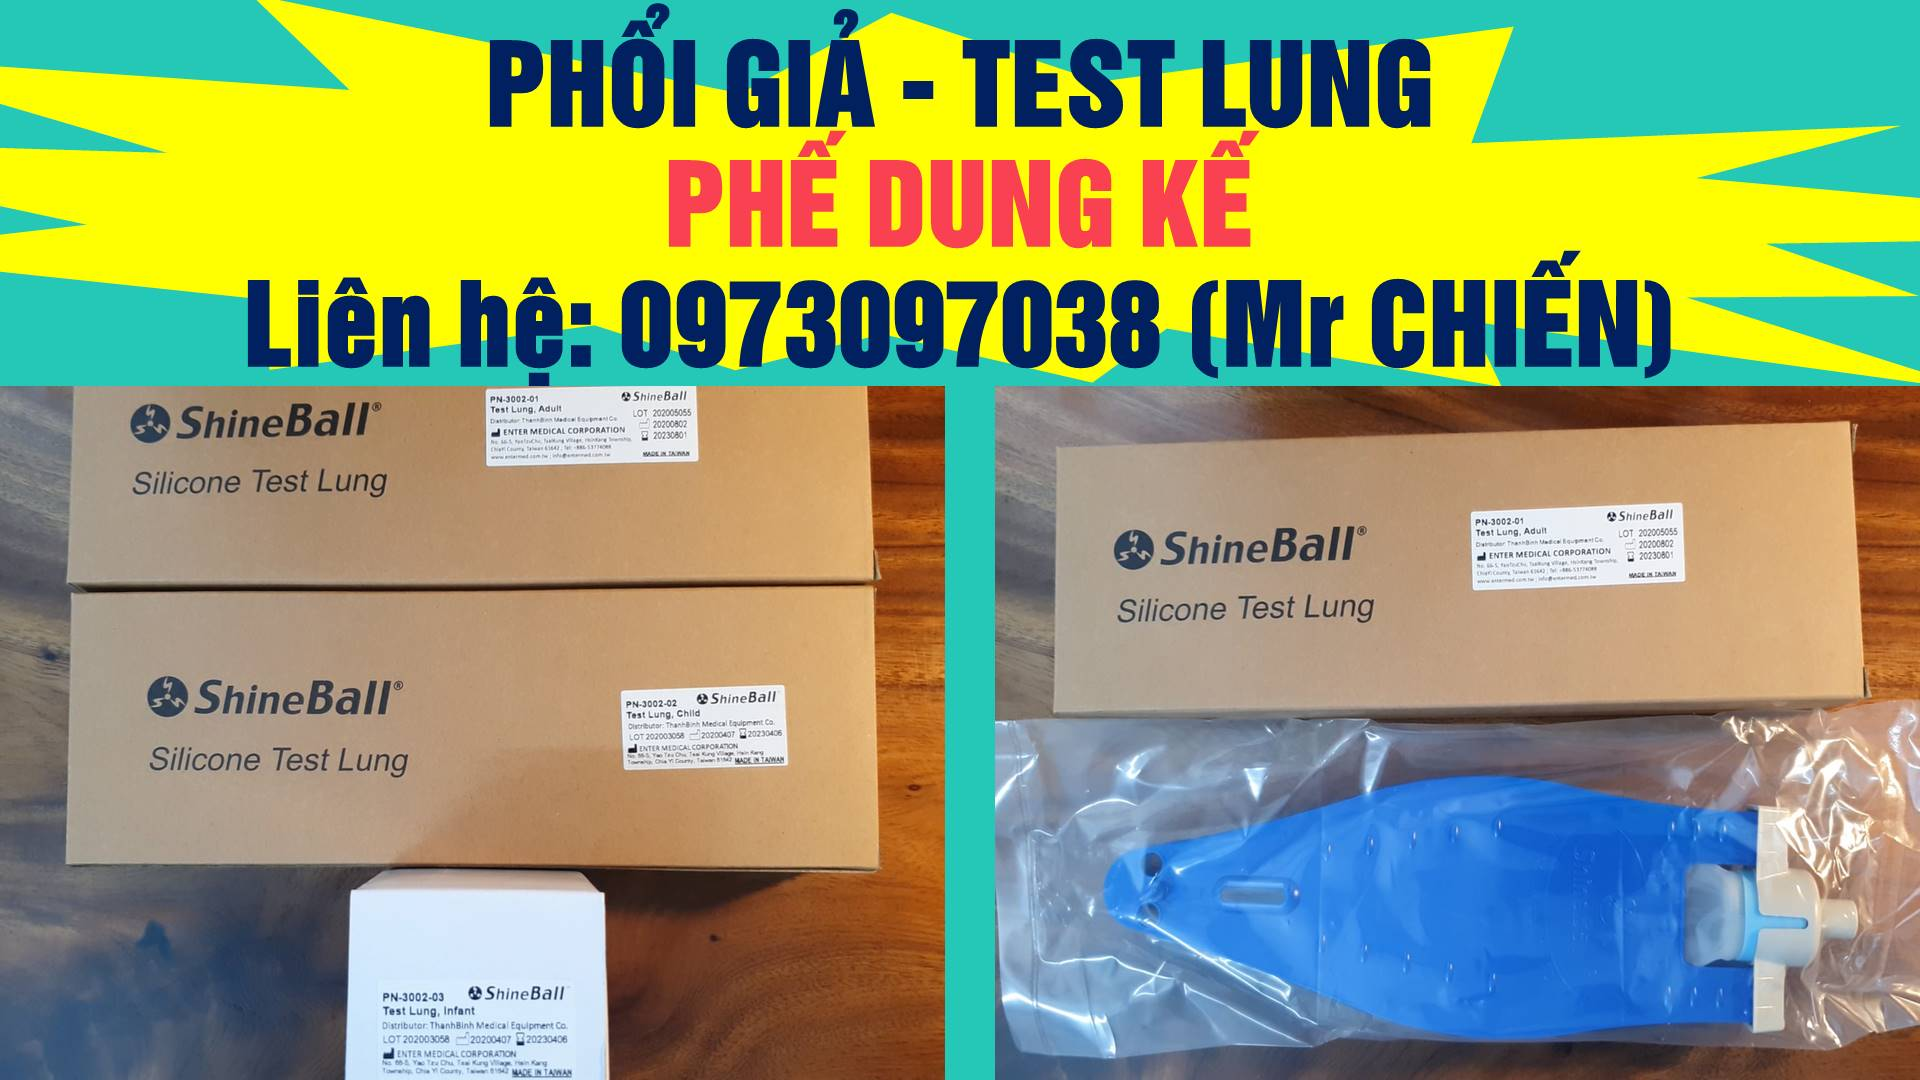 Phổi giả/ Test lung